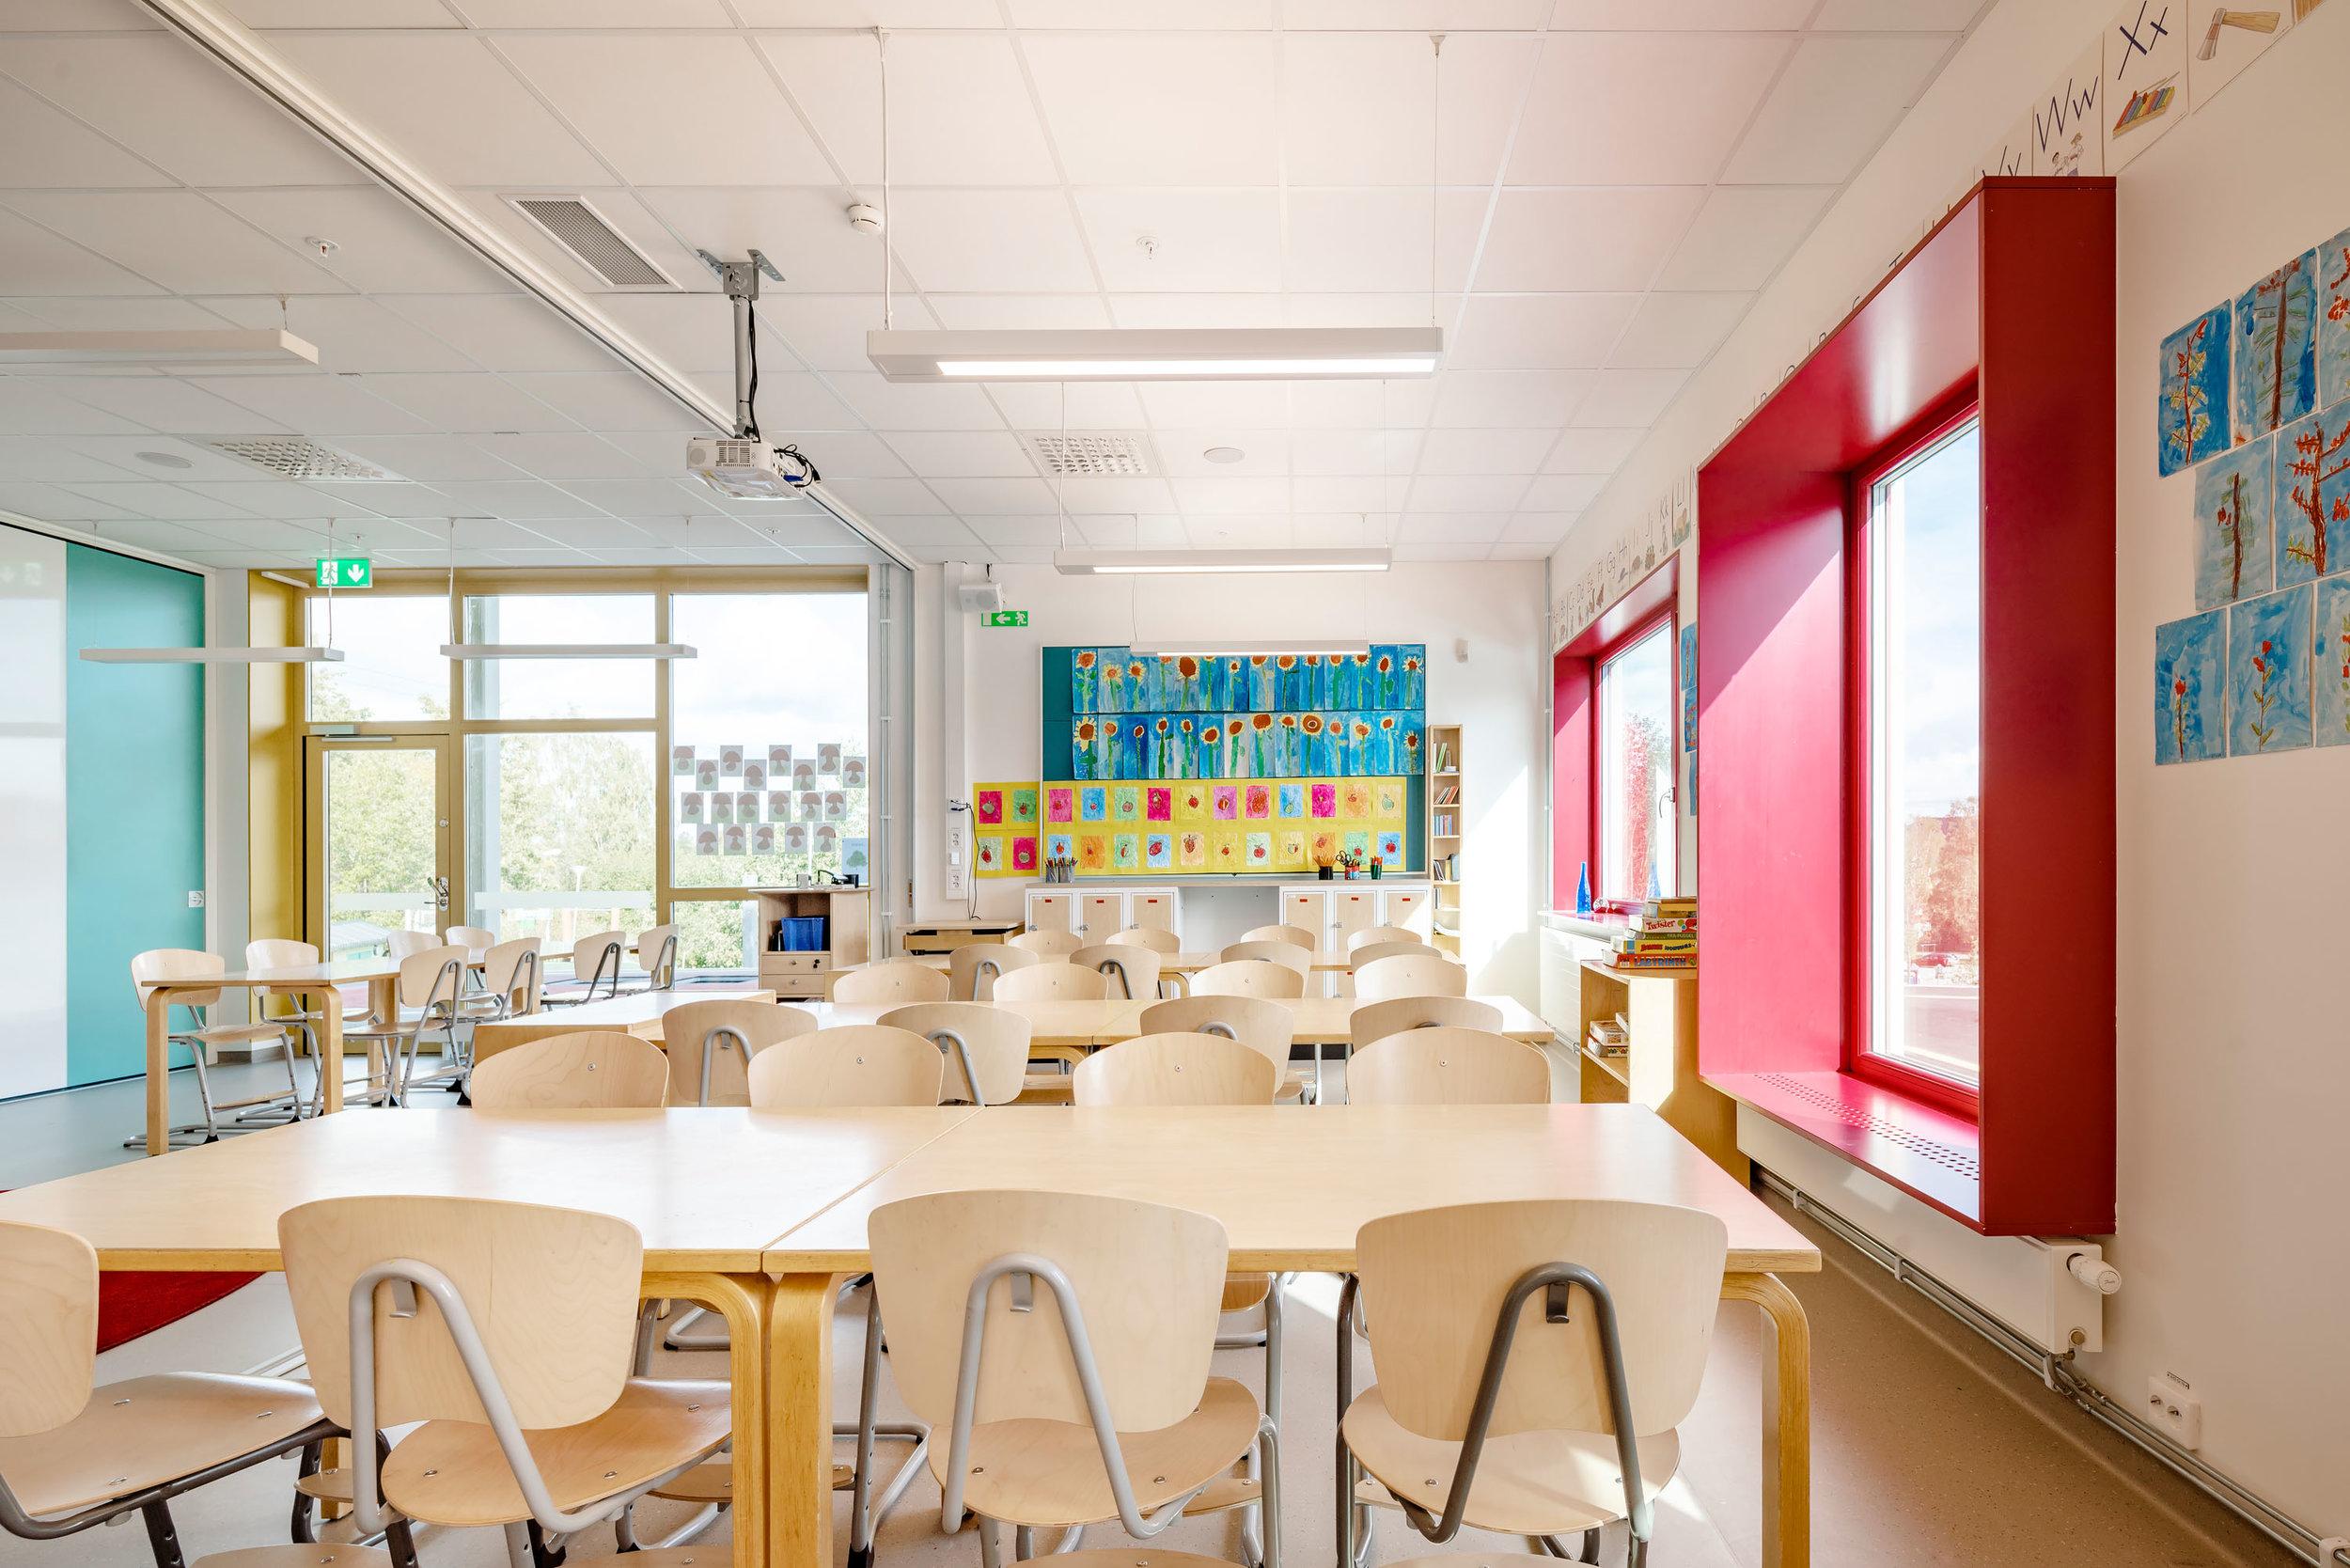 Skalbyskolan - Fotograf Mattias Hamren-18.jpg